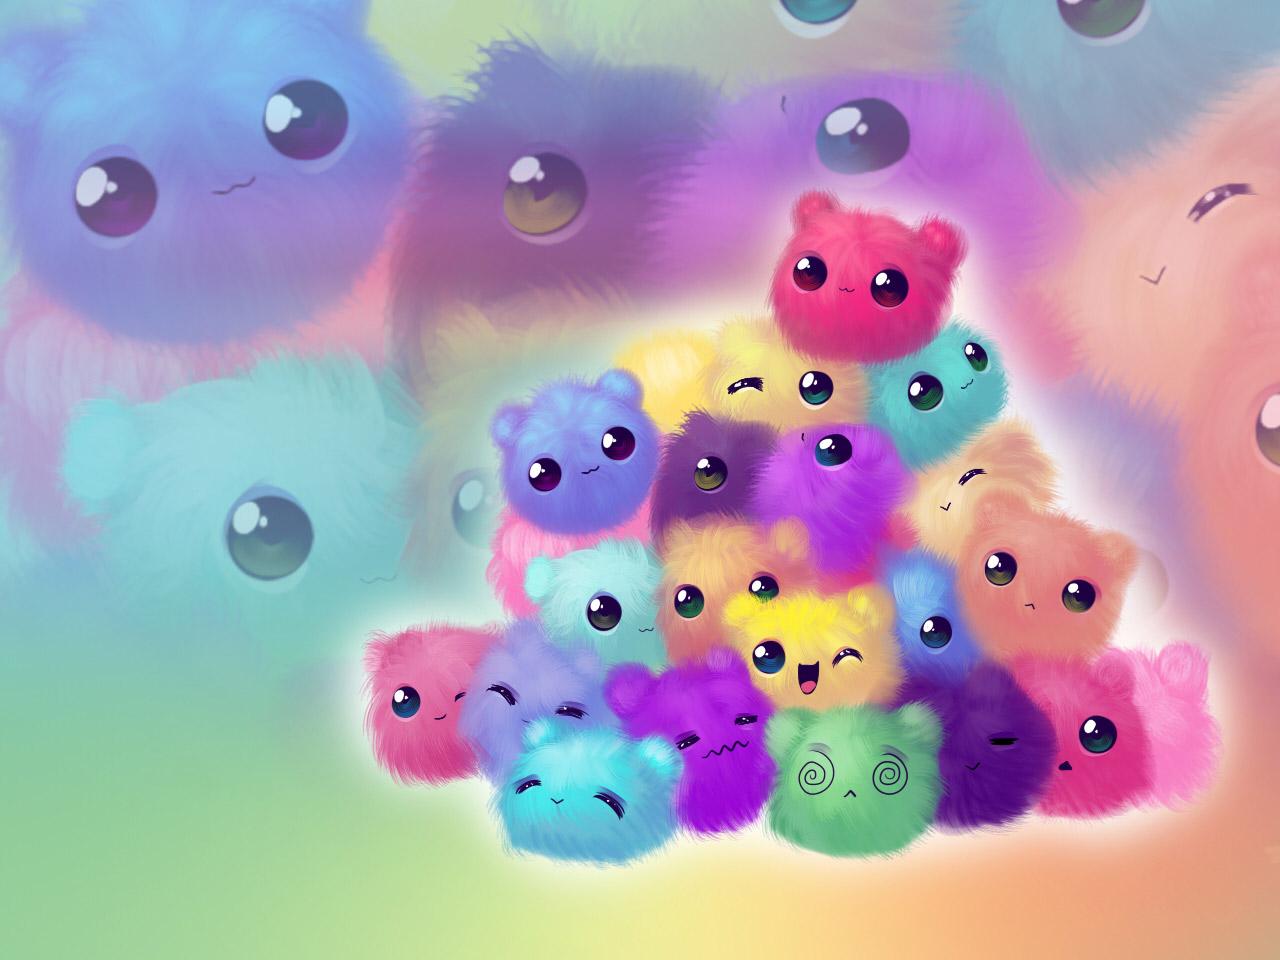 Walpapers Curot Cute For Desktop 1280x960 pixel Popular HD Wallpaper 1280x960